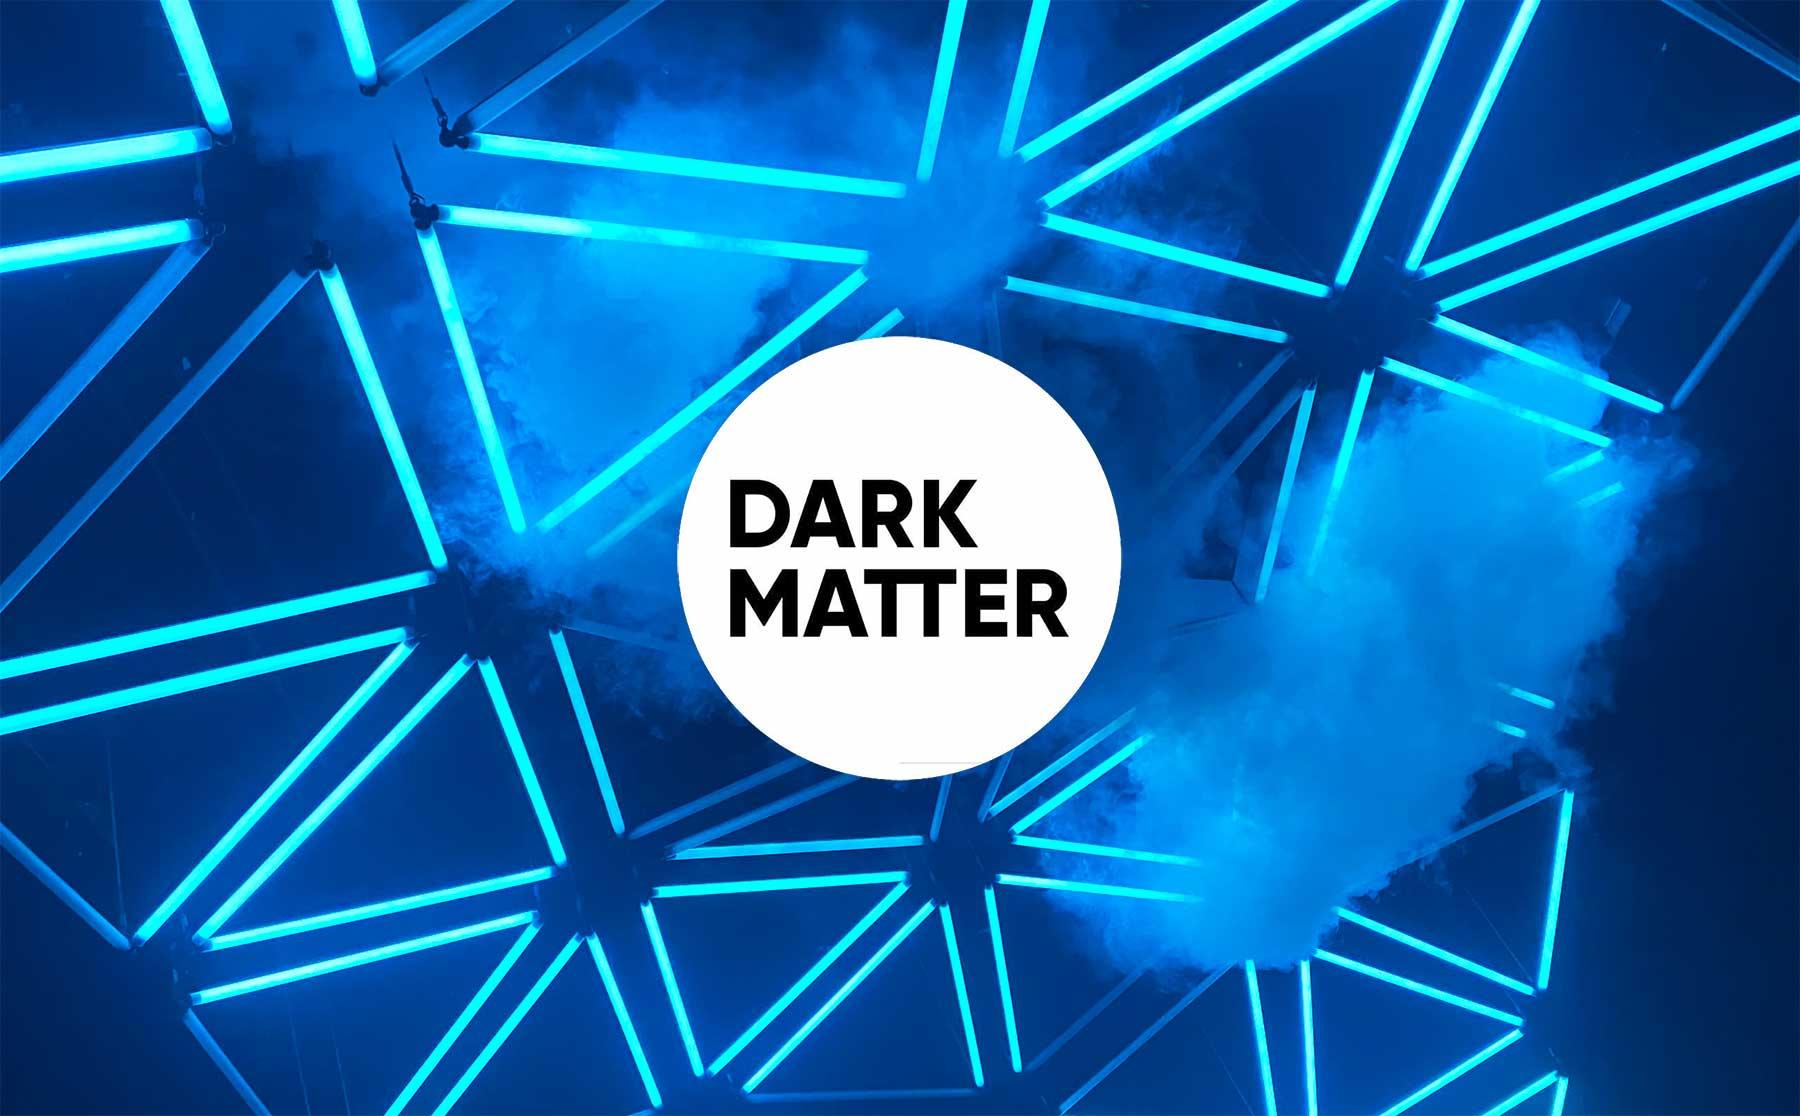 DARK MATTER BERLIN: Erfahrungsbericht und Ausstellungs-Tipp DARK-MATTER-BERLIN_01